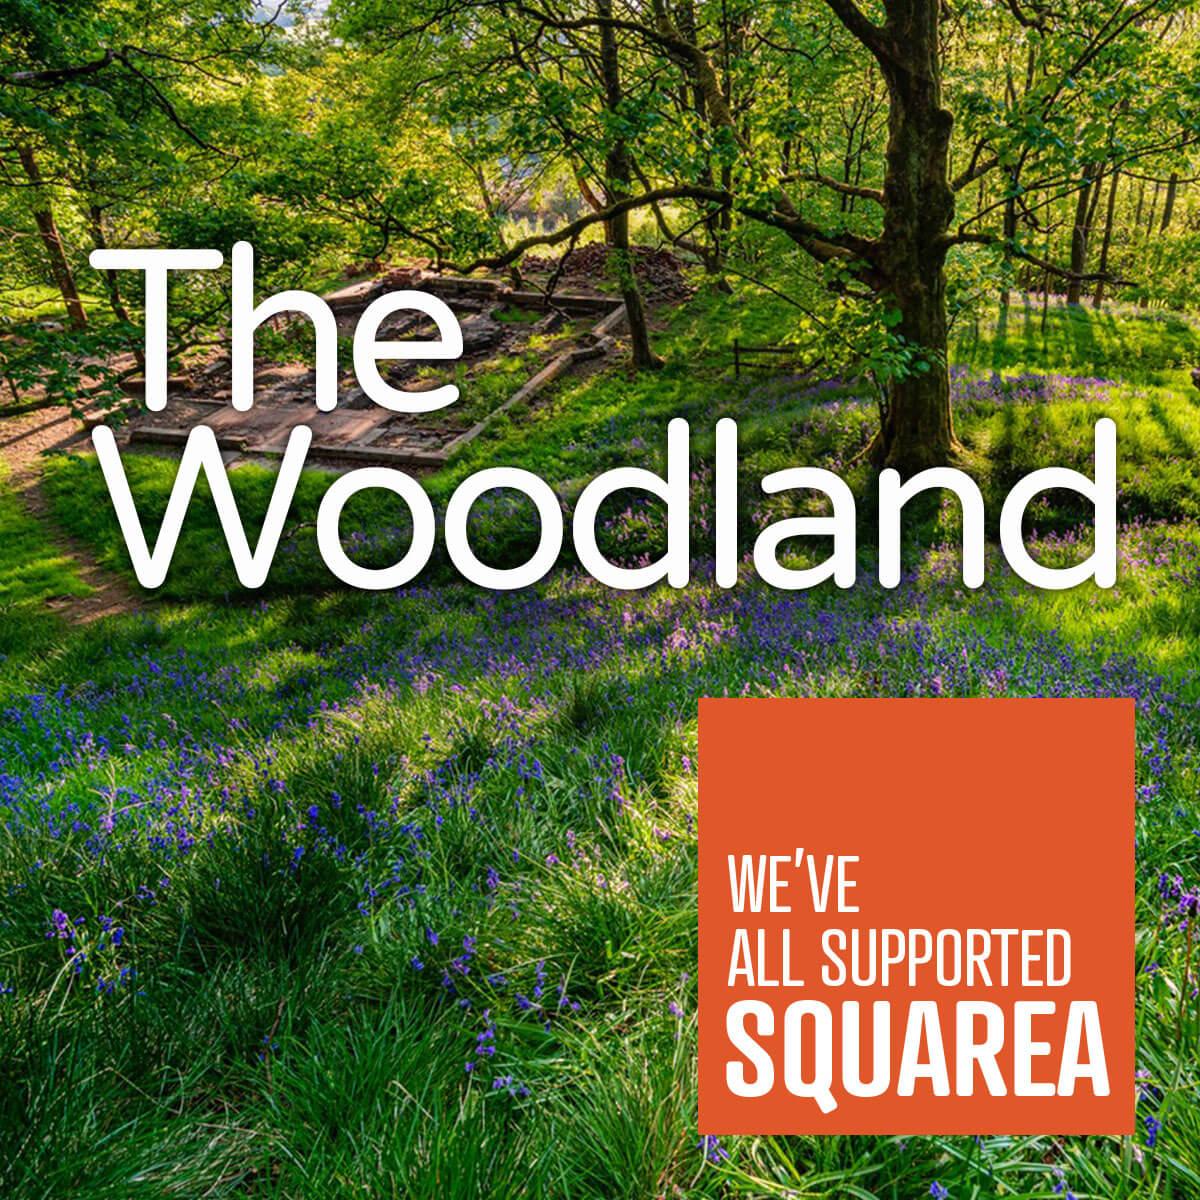 Woodlands - We've all supported Squarea